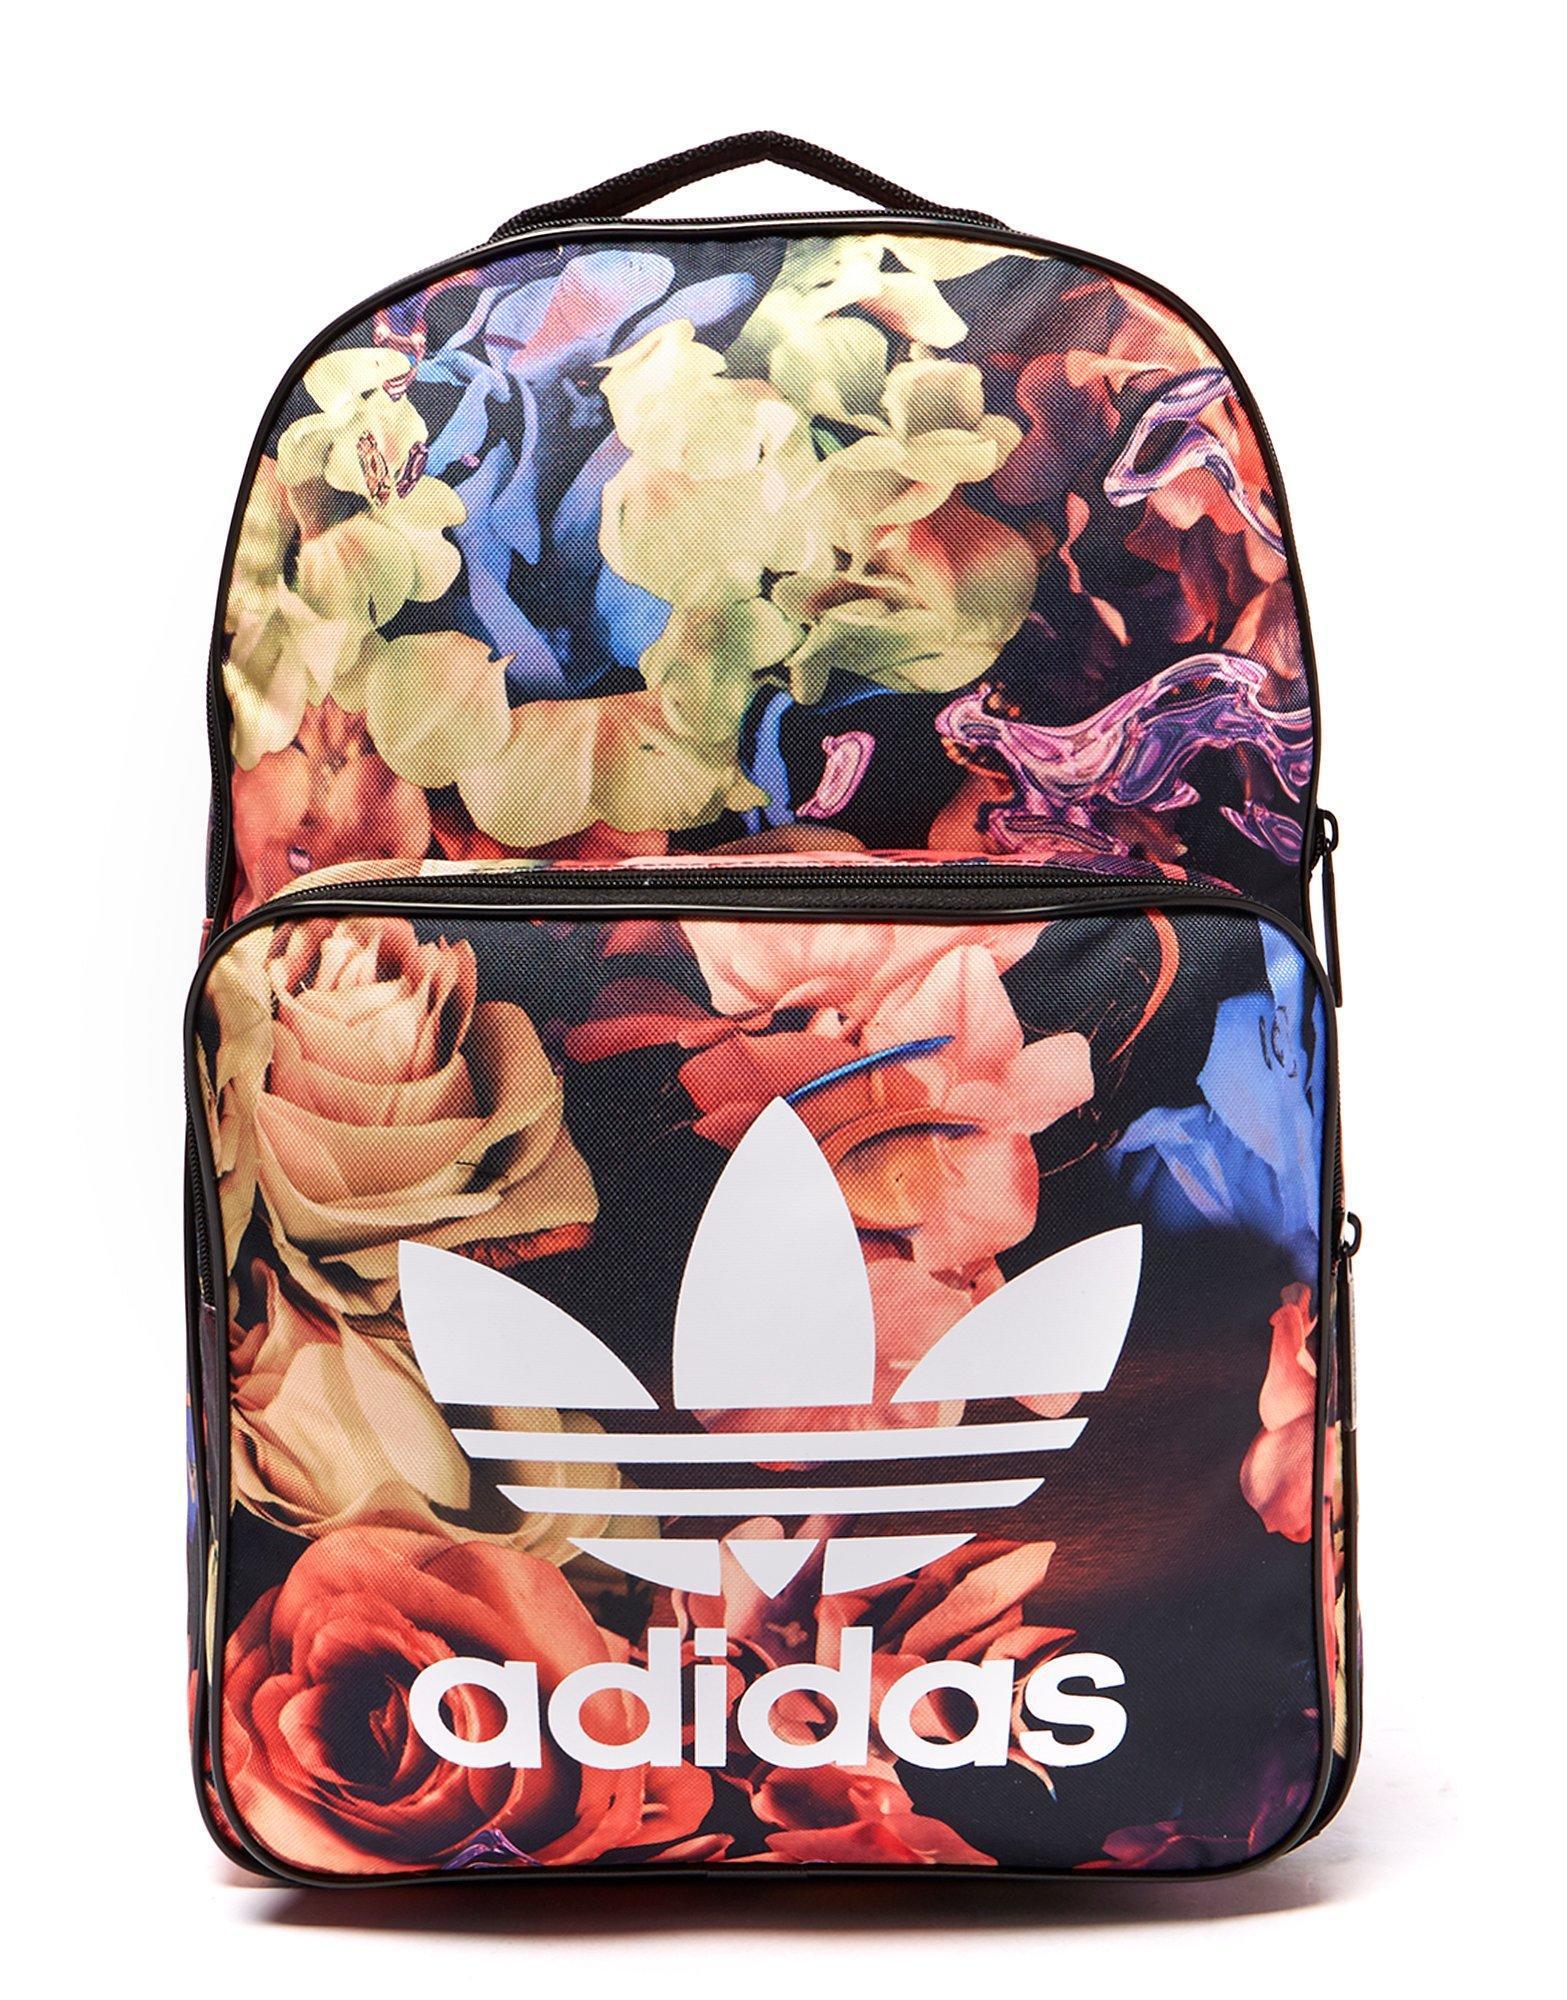 ae4359c0096d0 adidas Originals Rose Backpack for Men - Lyst